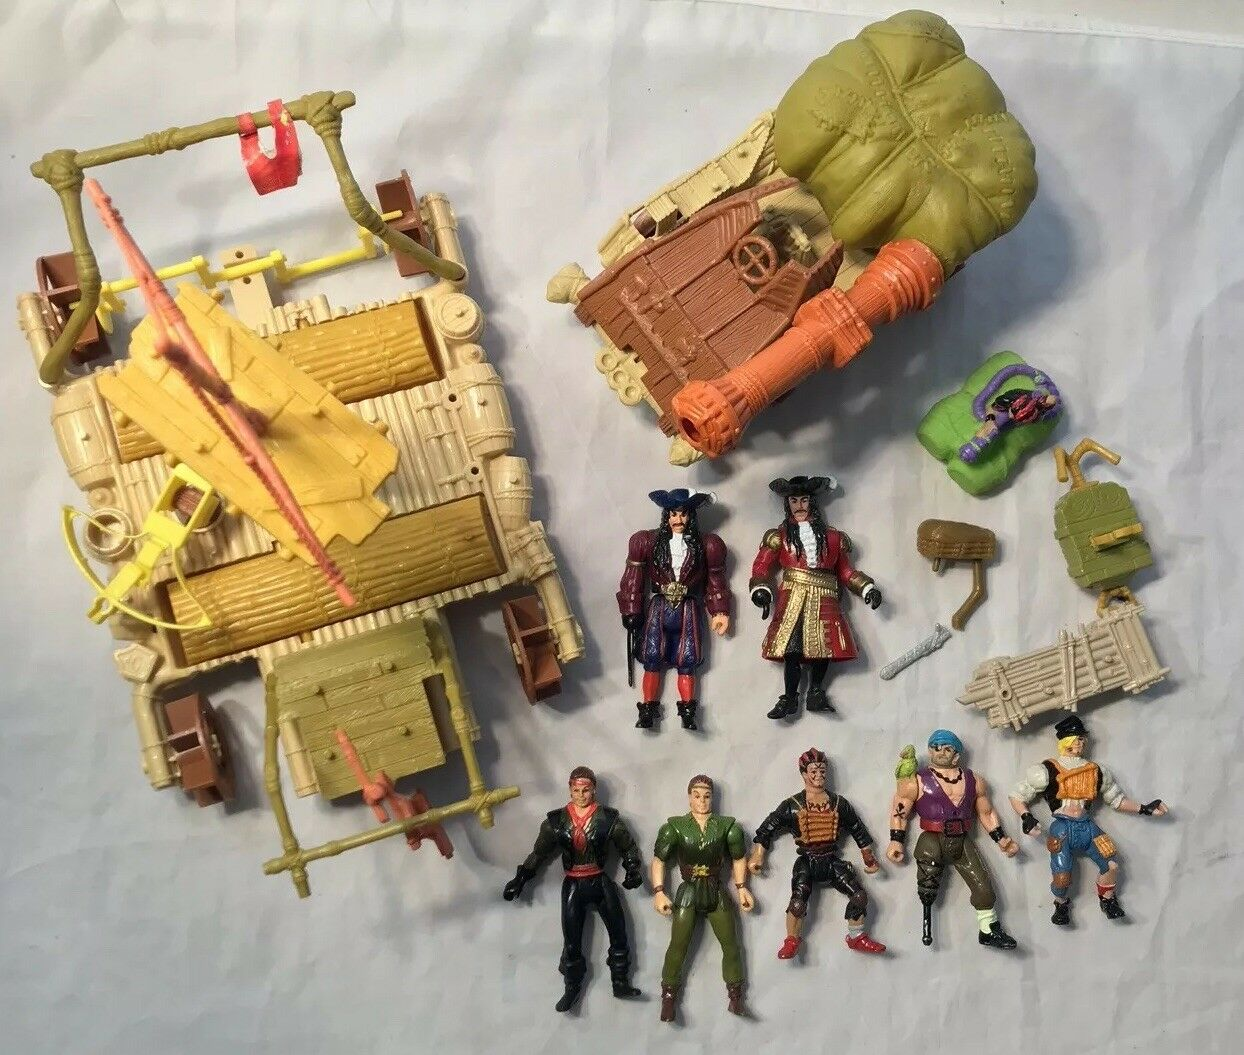 RARE 1991 TriStar Hook Peter Pan Lost Boys Pirates Figures Lot vintage Mattel